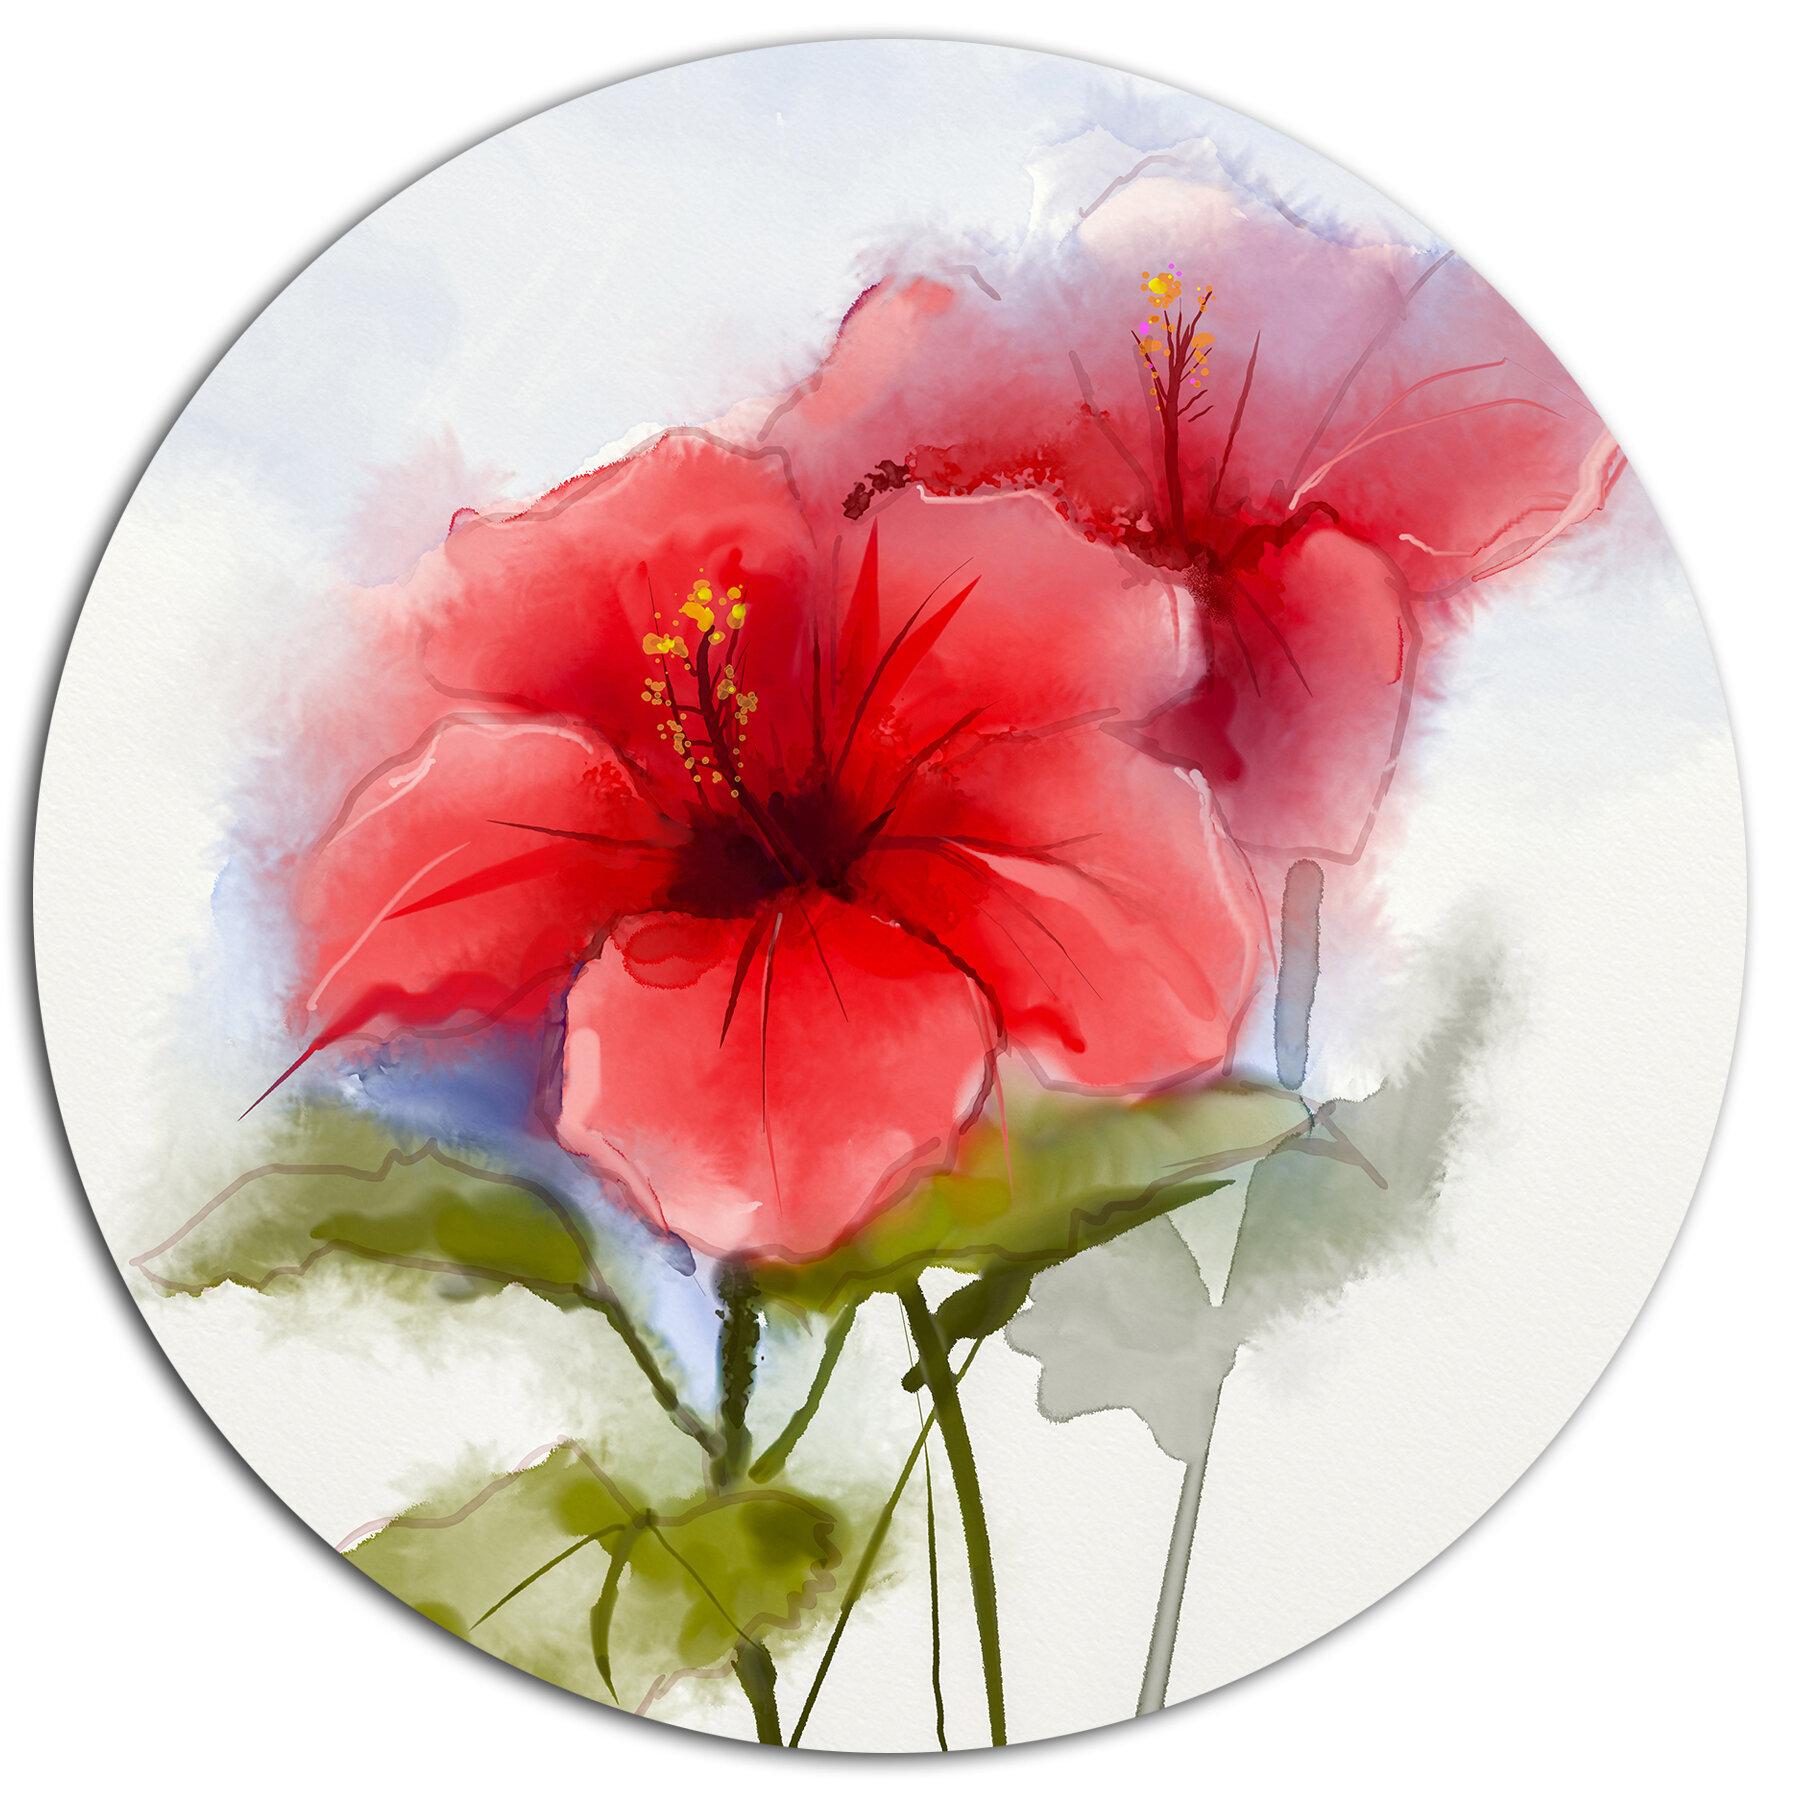 Designart watercolor painting red hibiscus flower oil painting designart watercolor painting red hibiscus flower oil painting print on metal wayfair izmirmasajfo